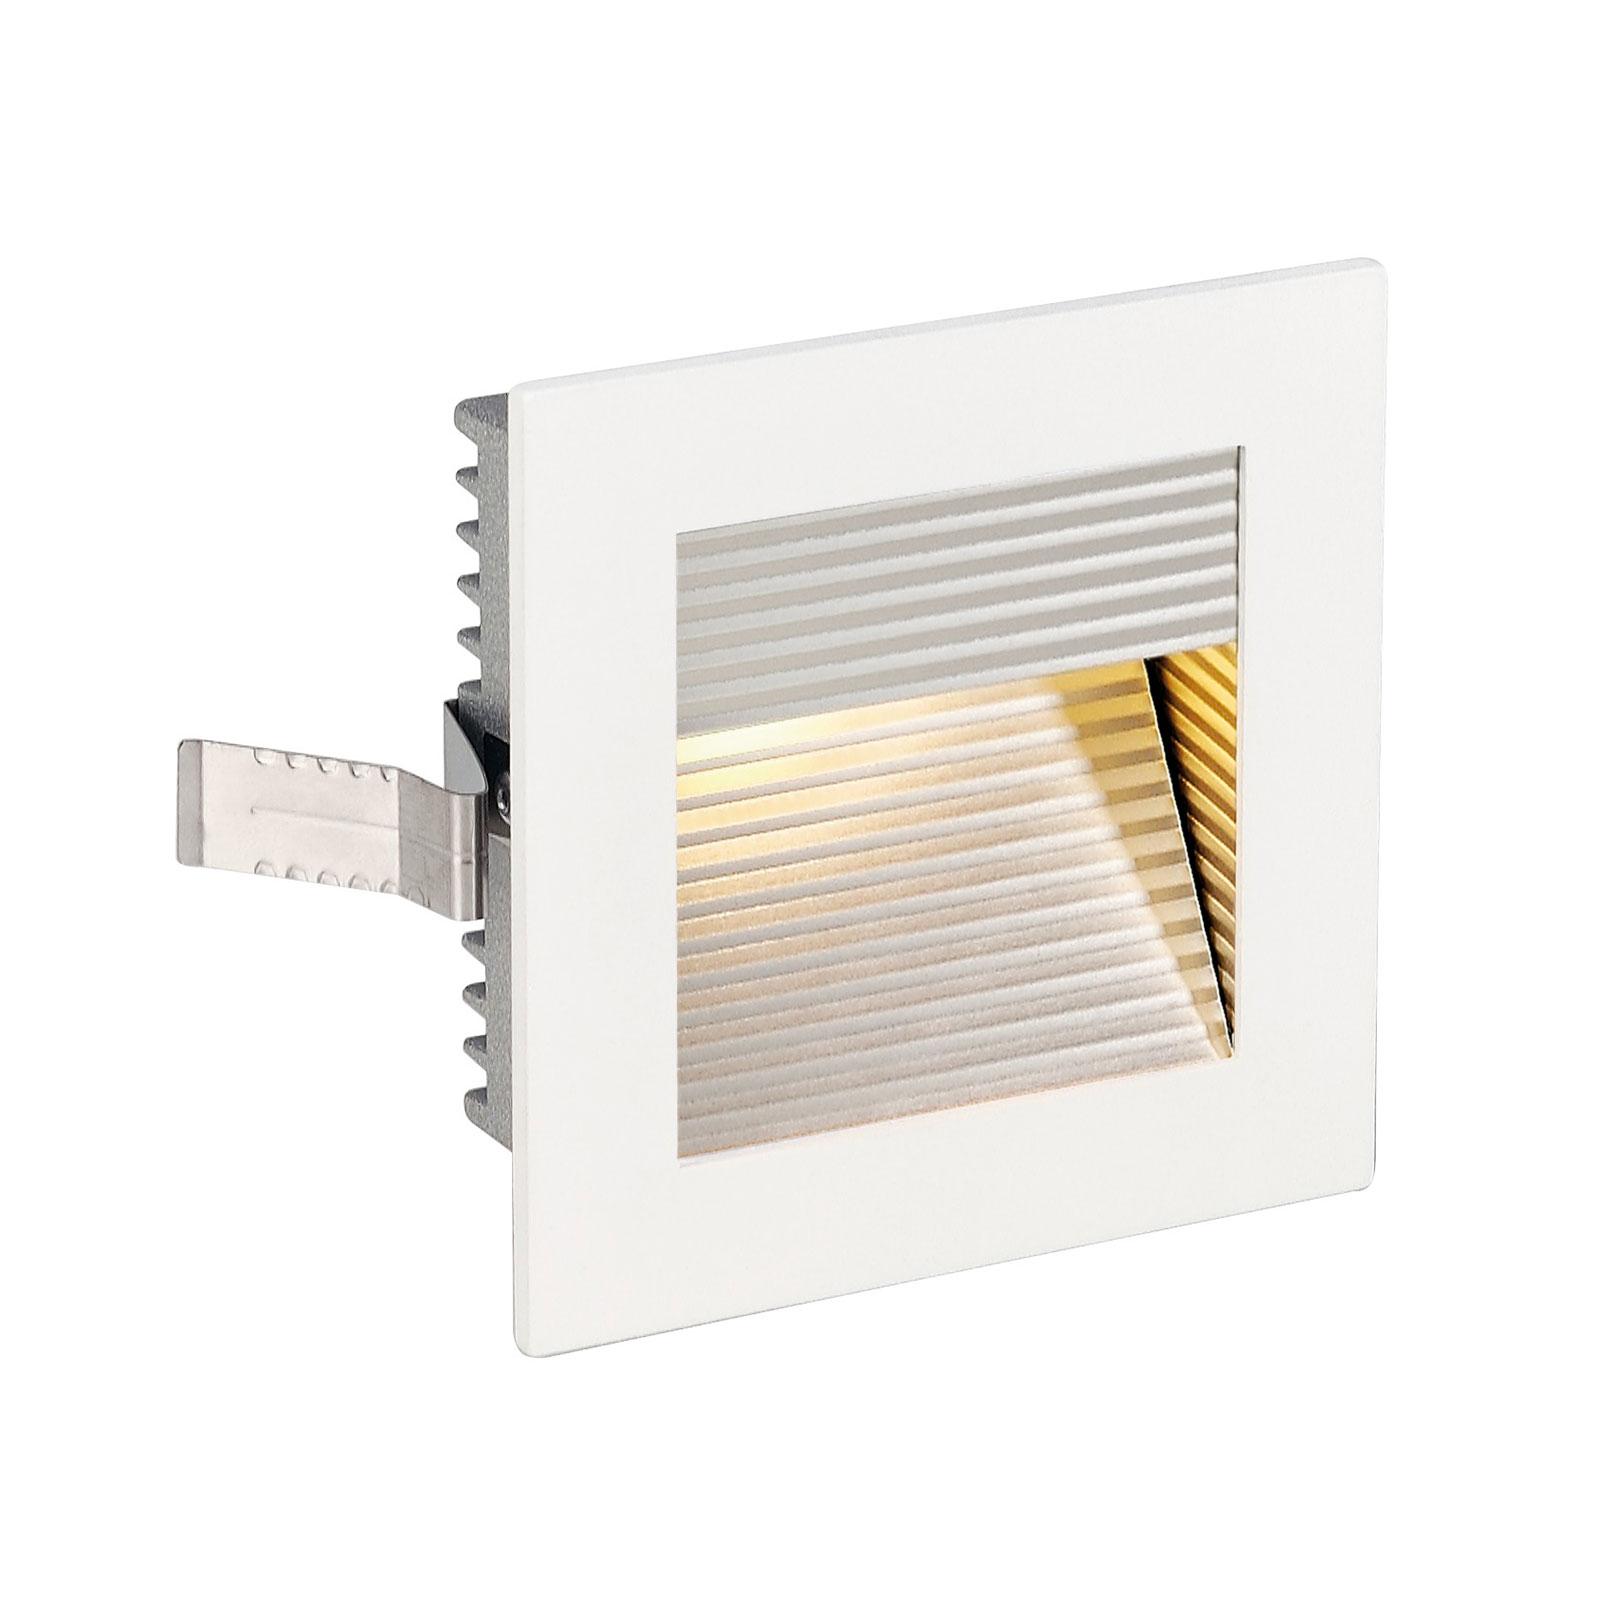 SLV oprawa wpuszczana LED Frame Curve LED 3000K